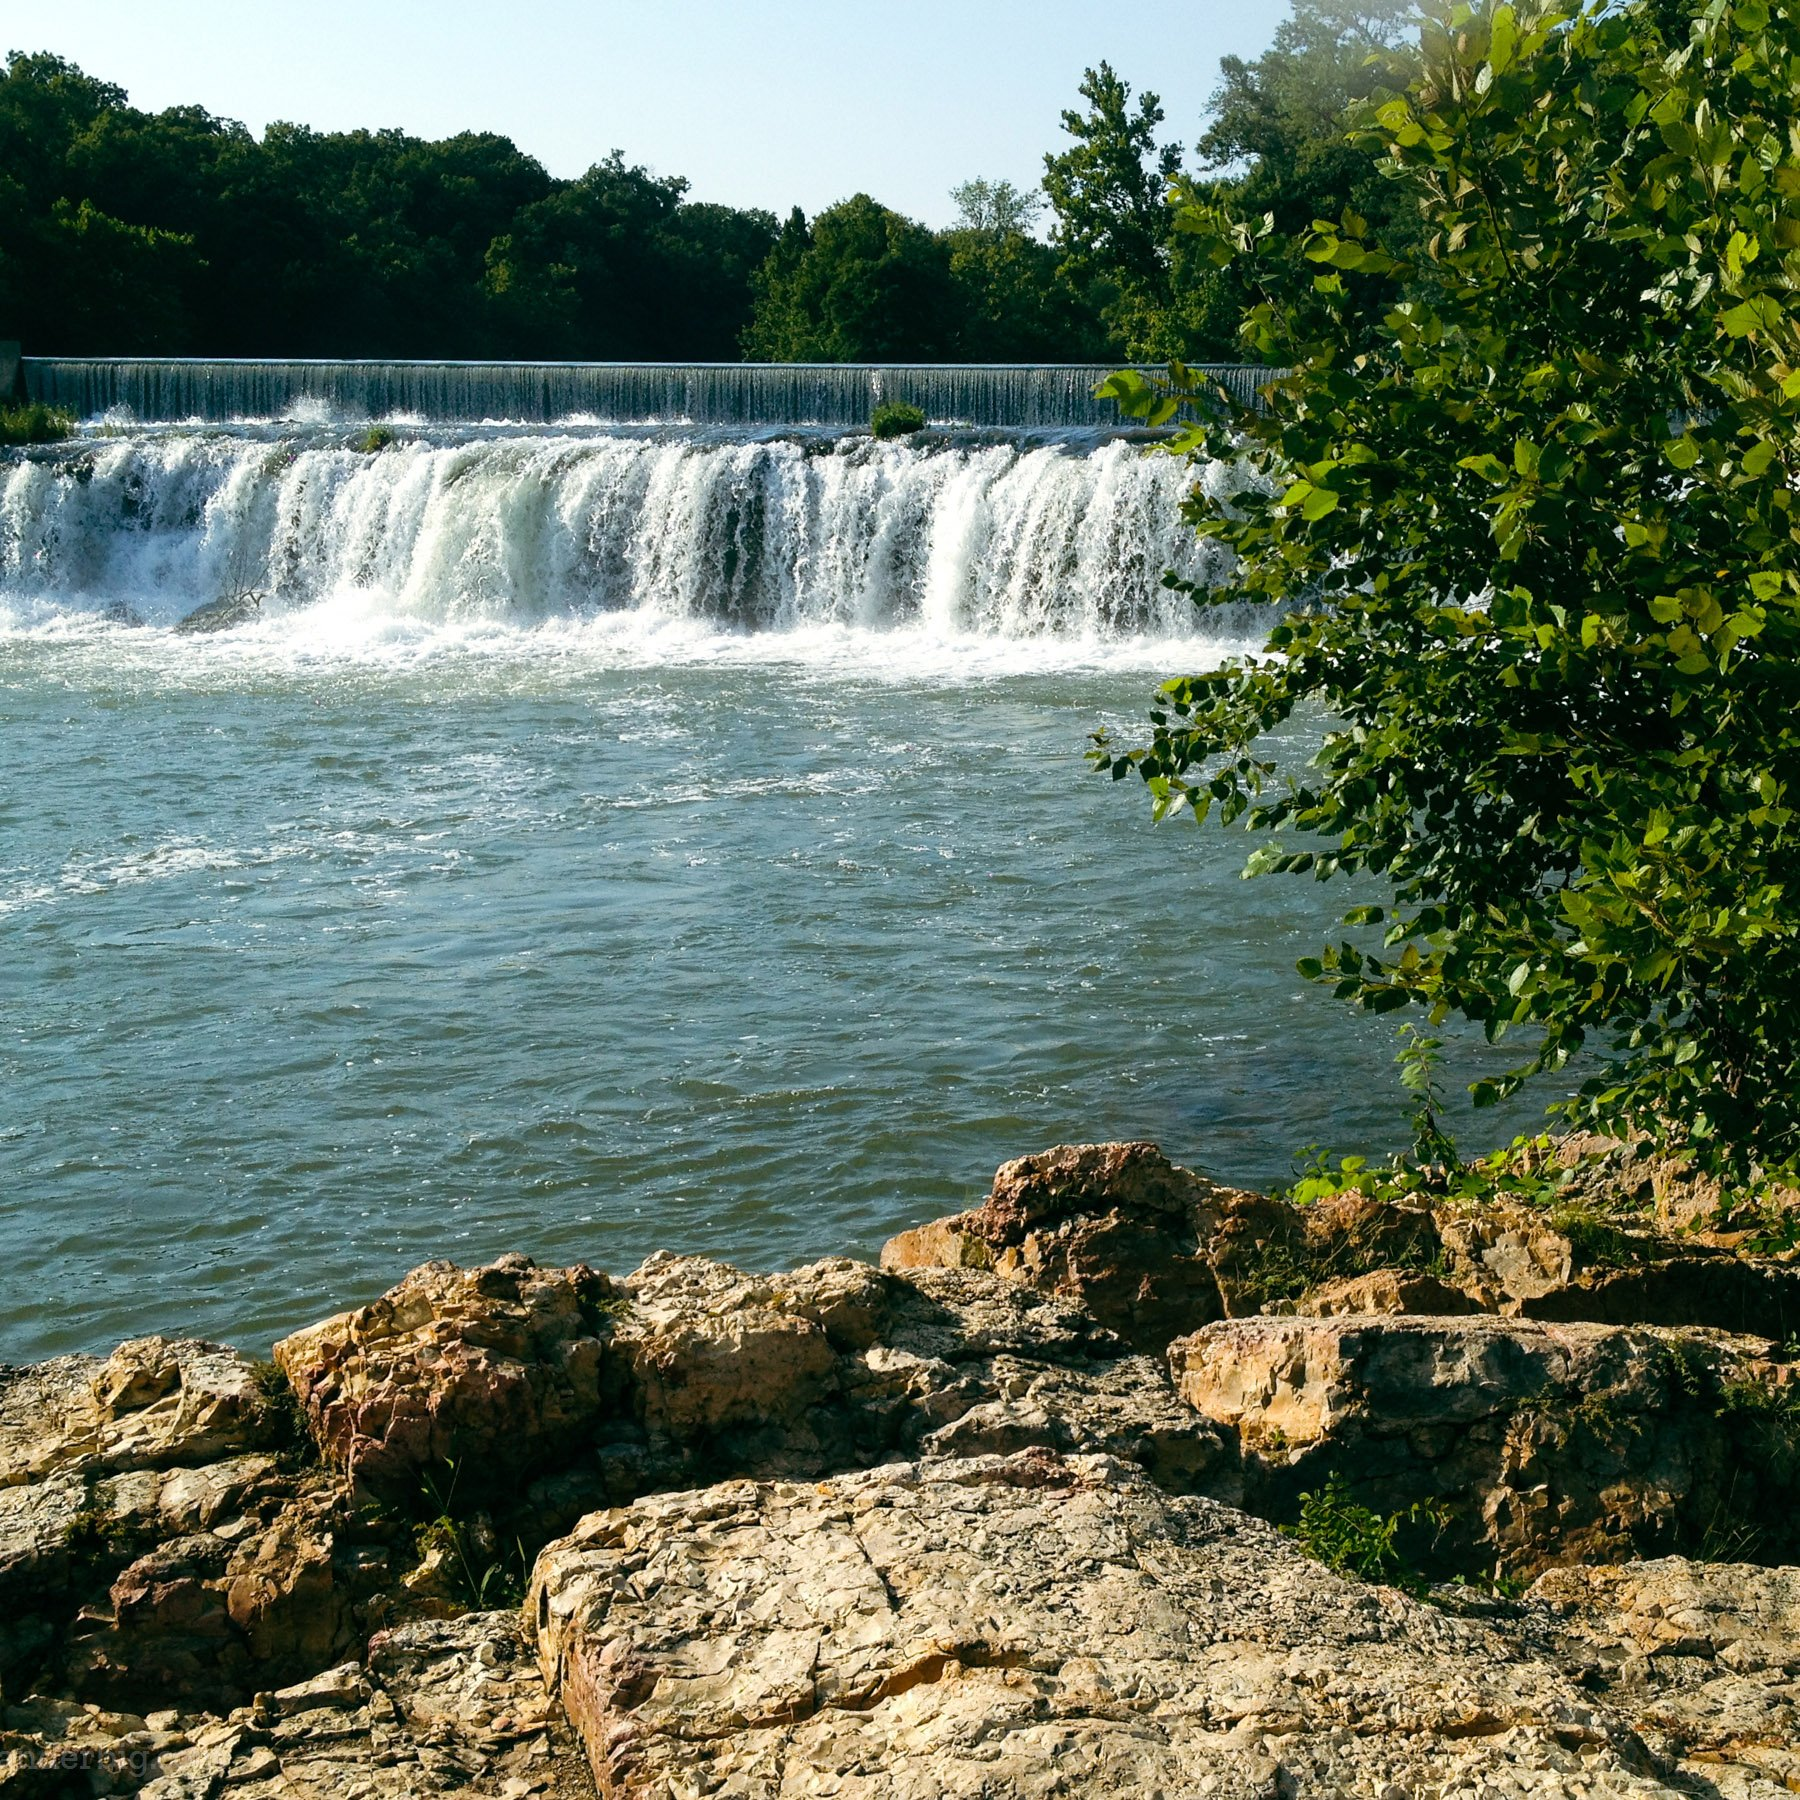 Water from shoal creek flow over the chert rock formation making up grand falls waterfall, near joplin, mo.